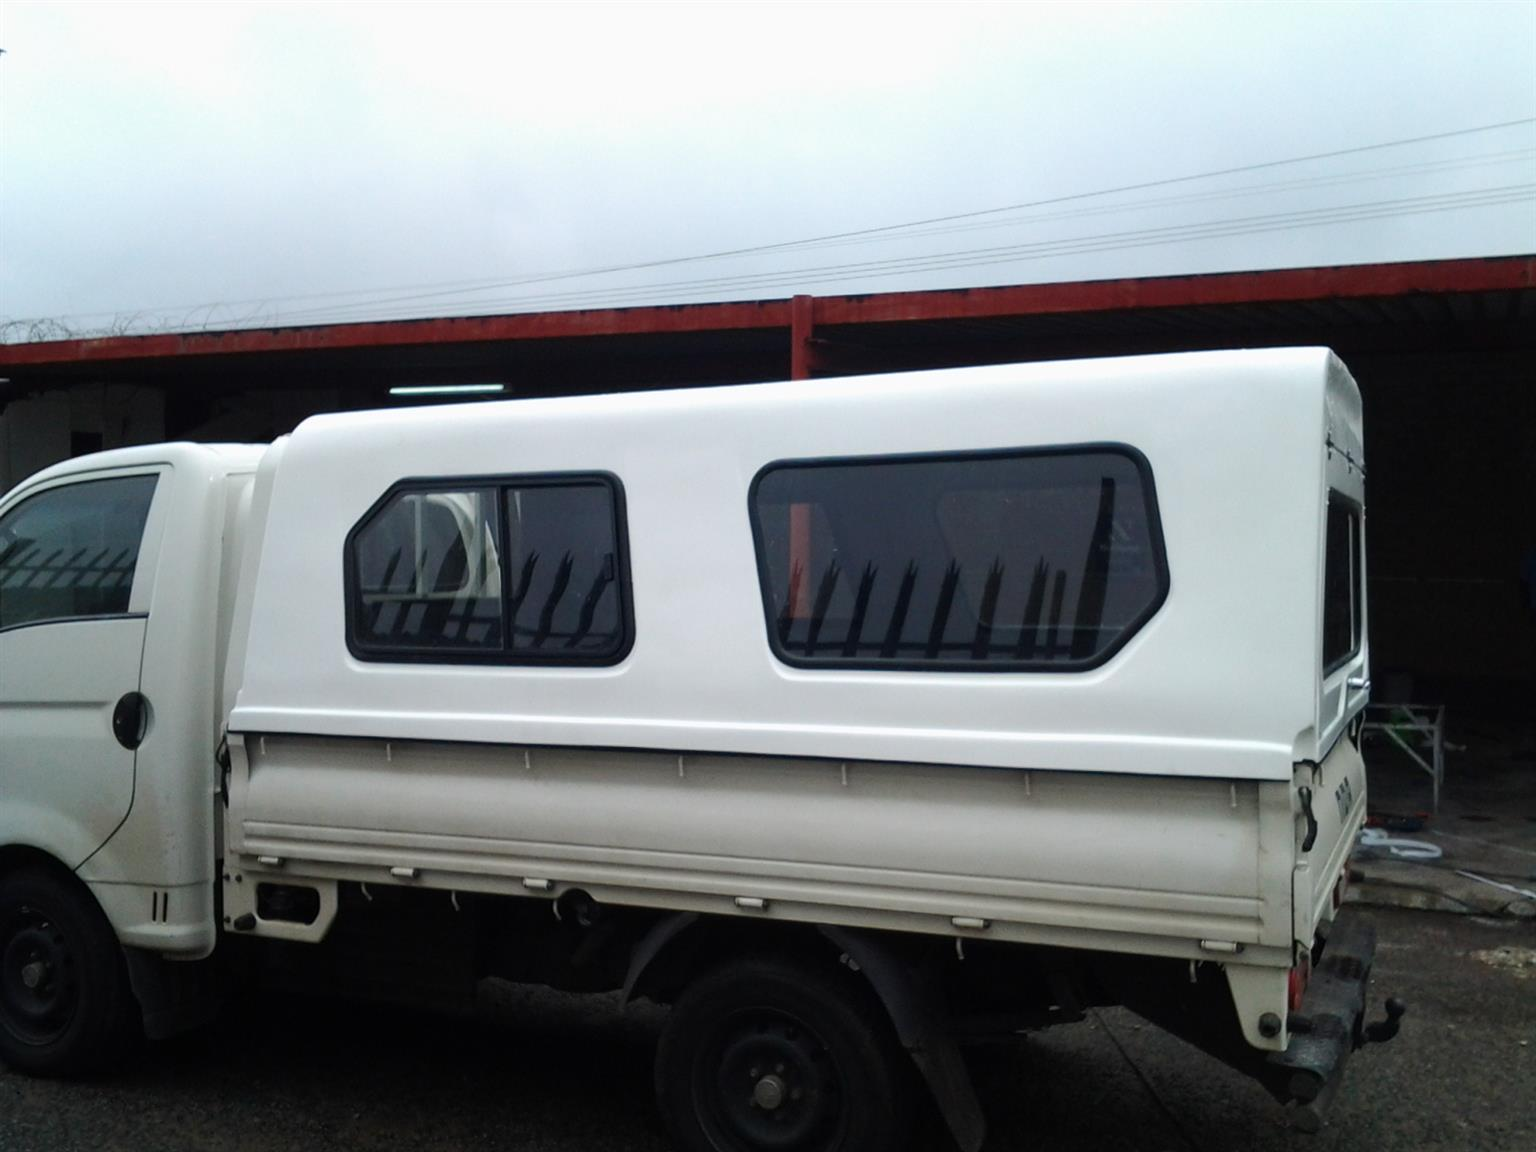 NEW HYUNDAI H100 W/W CANOPY FOR SALE